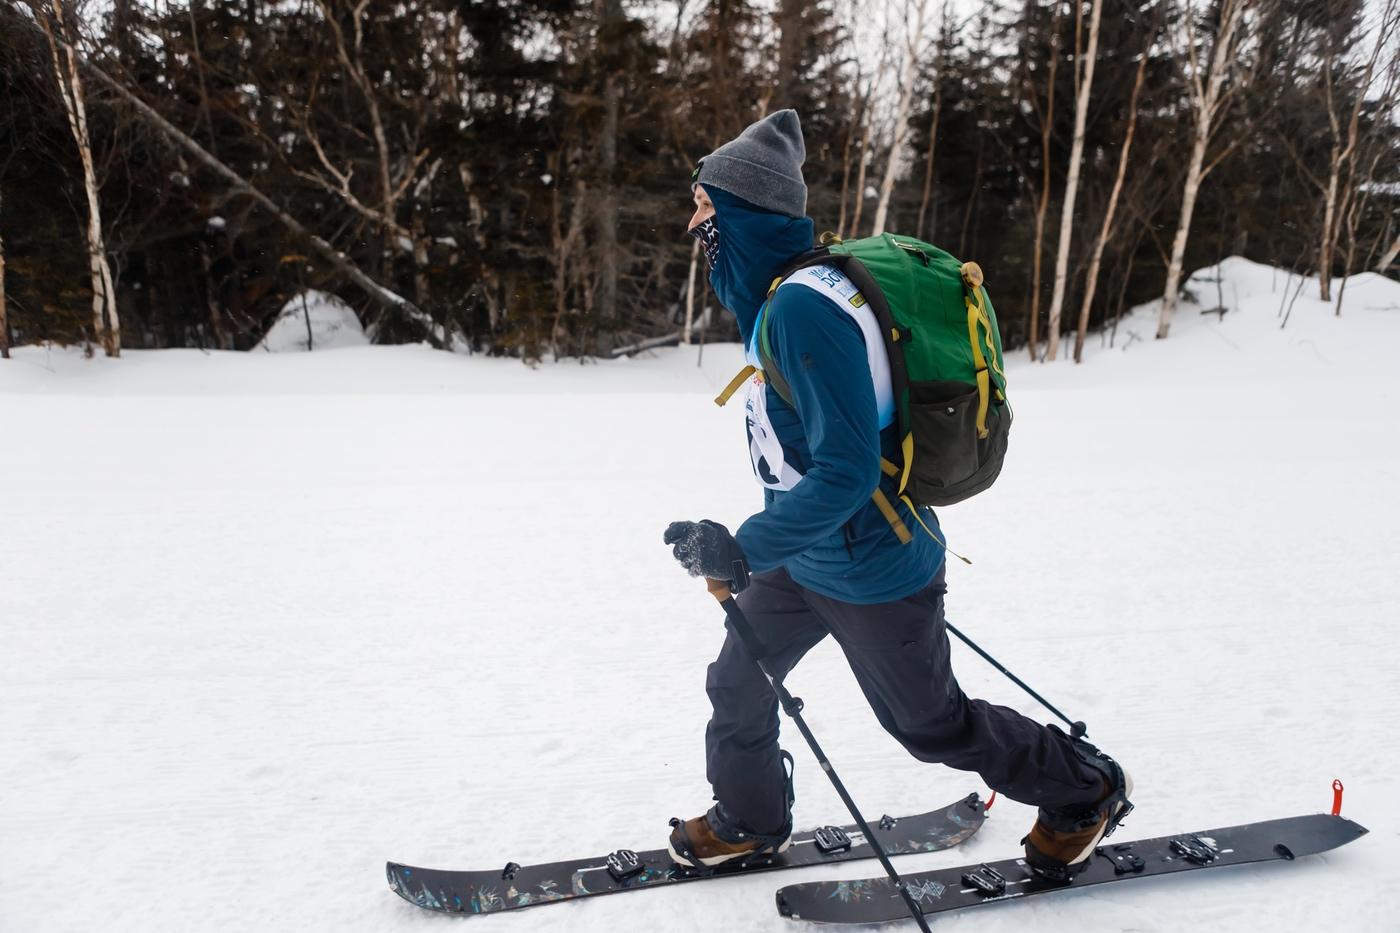 WinterKids Downhill 24 2021 SDP 3724